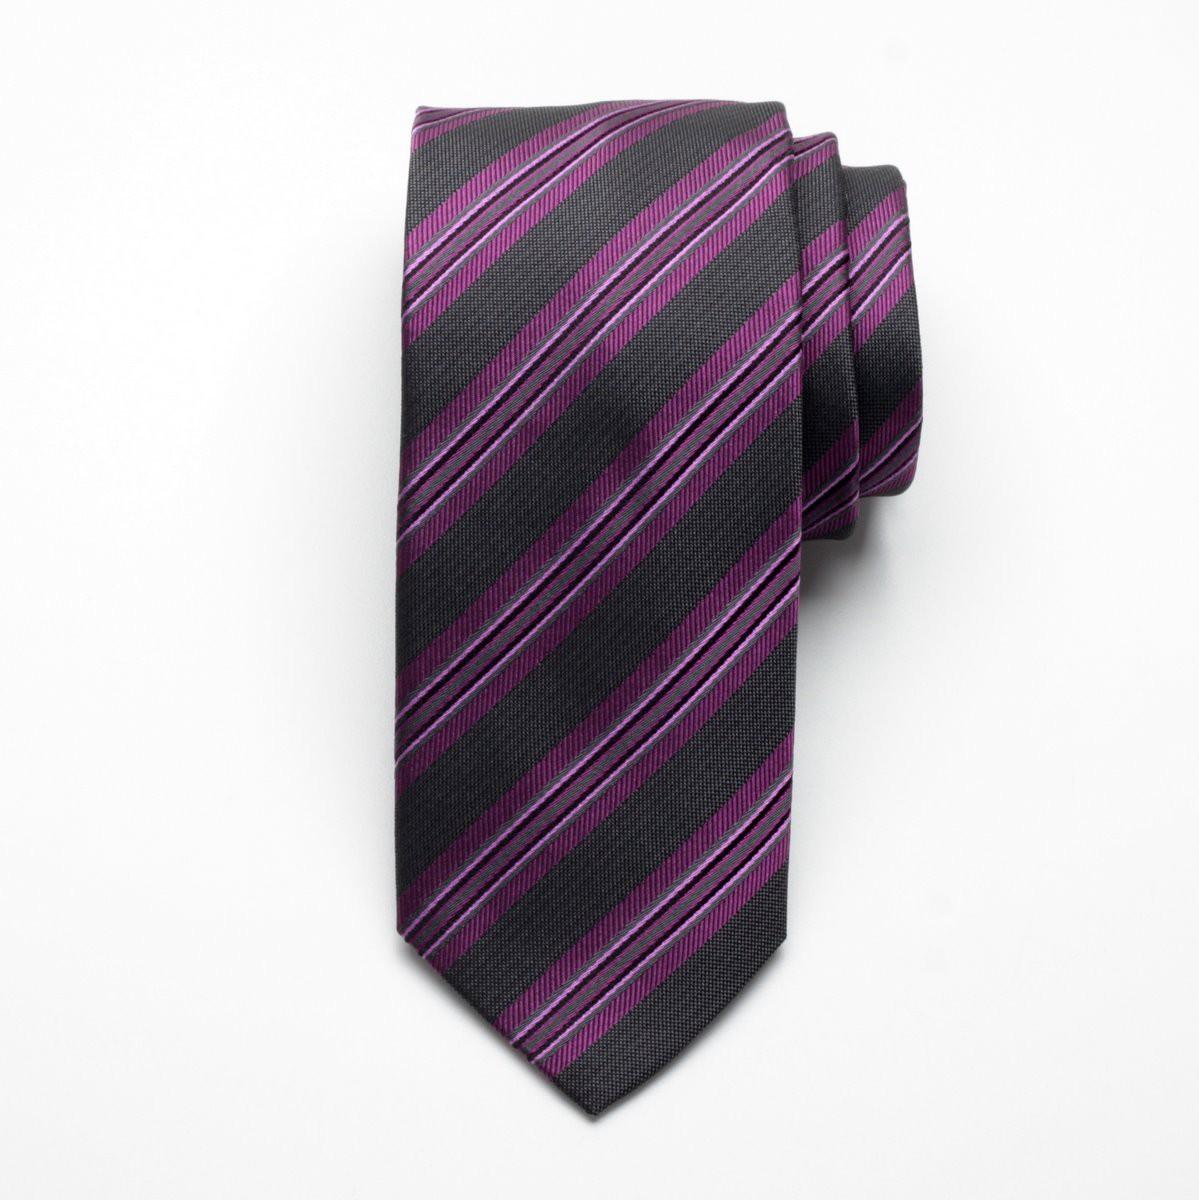 Krawat jedwabny Fine Selection (wzór 90)